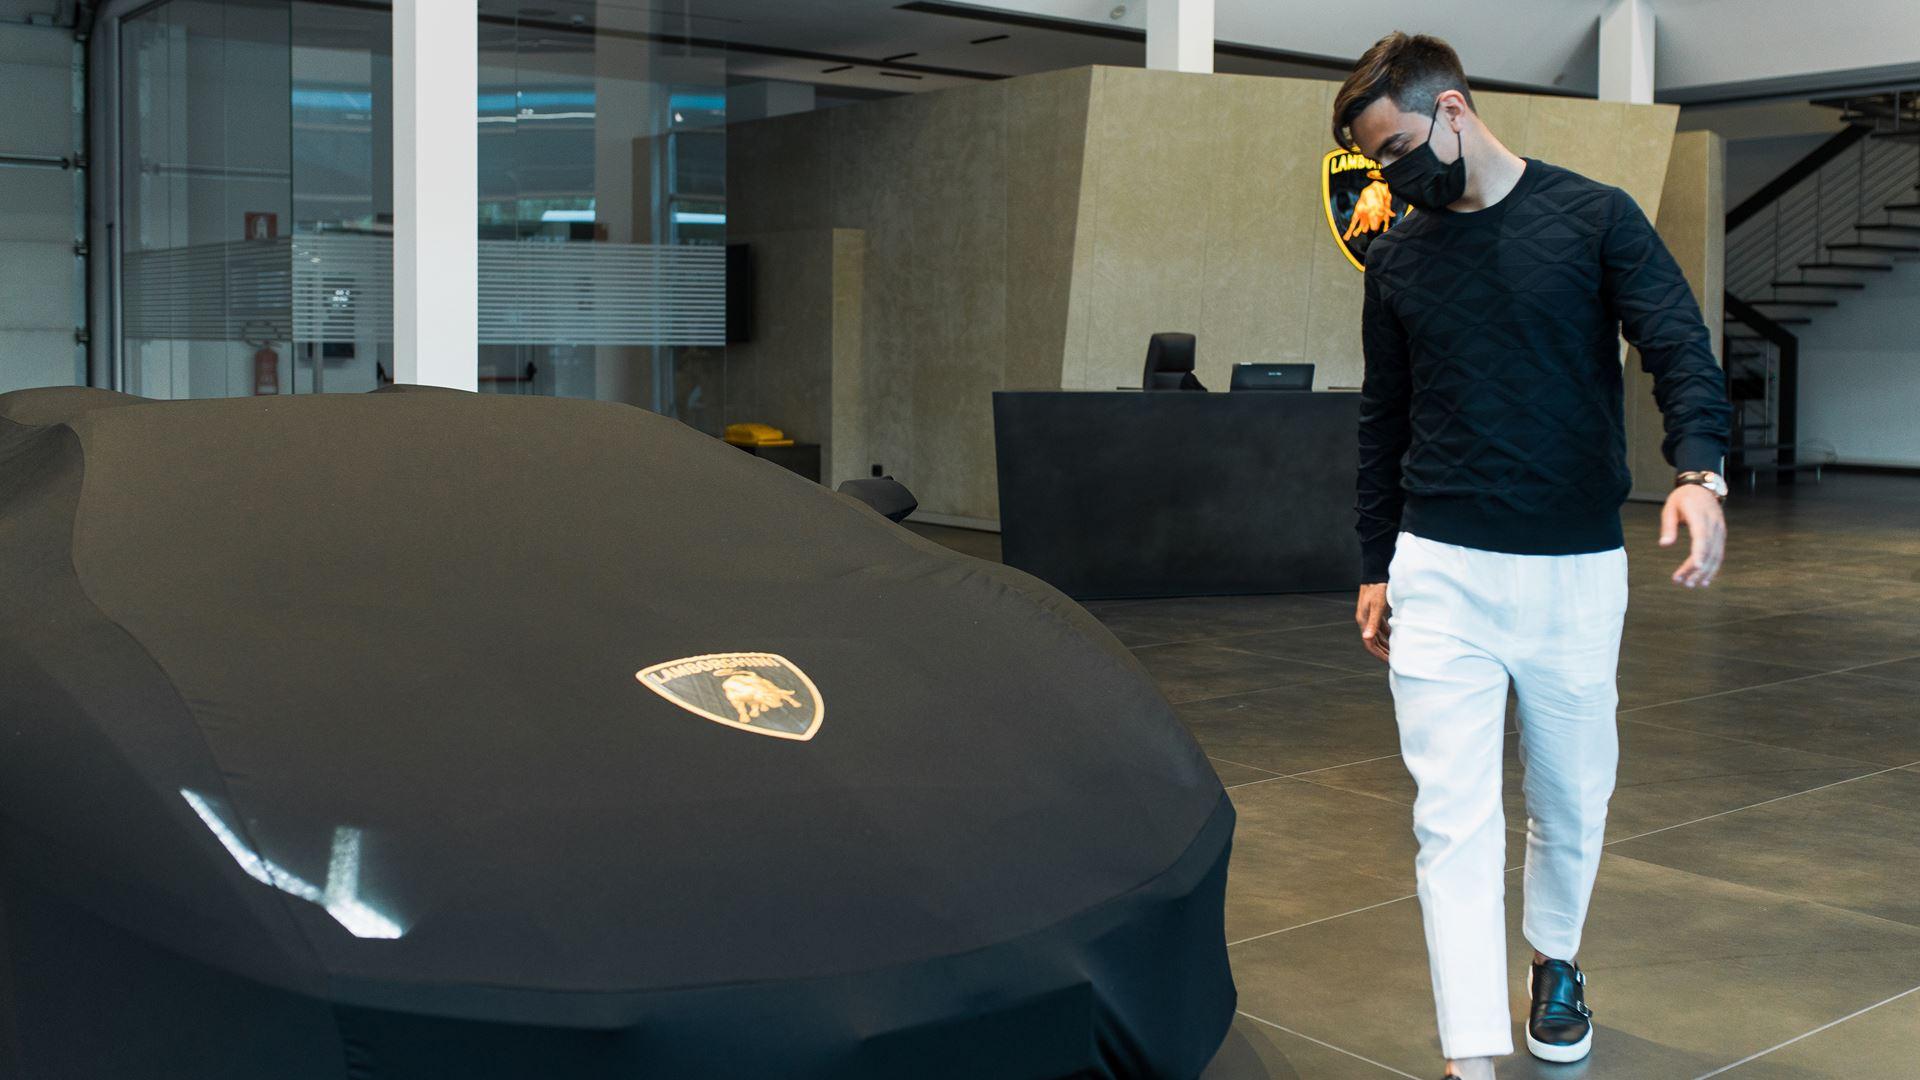 Football Star Paulo Dybala Celebrates 100th Goal with a New Lamborghini - Image 5